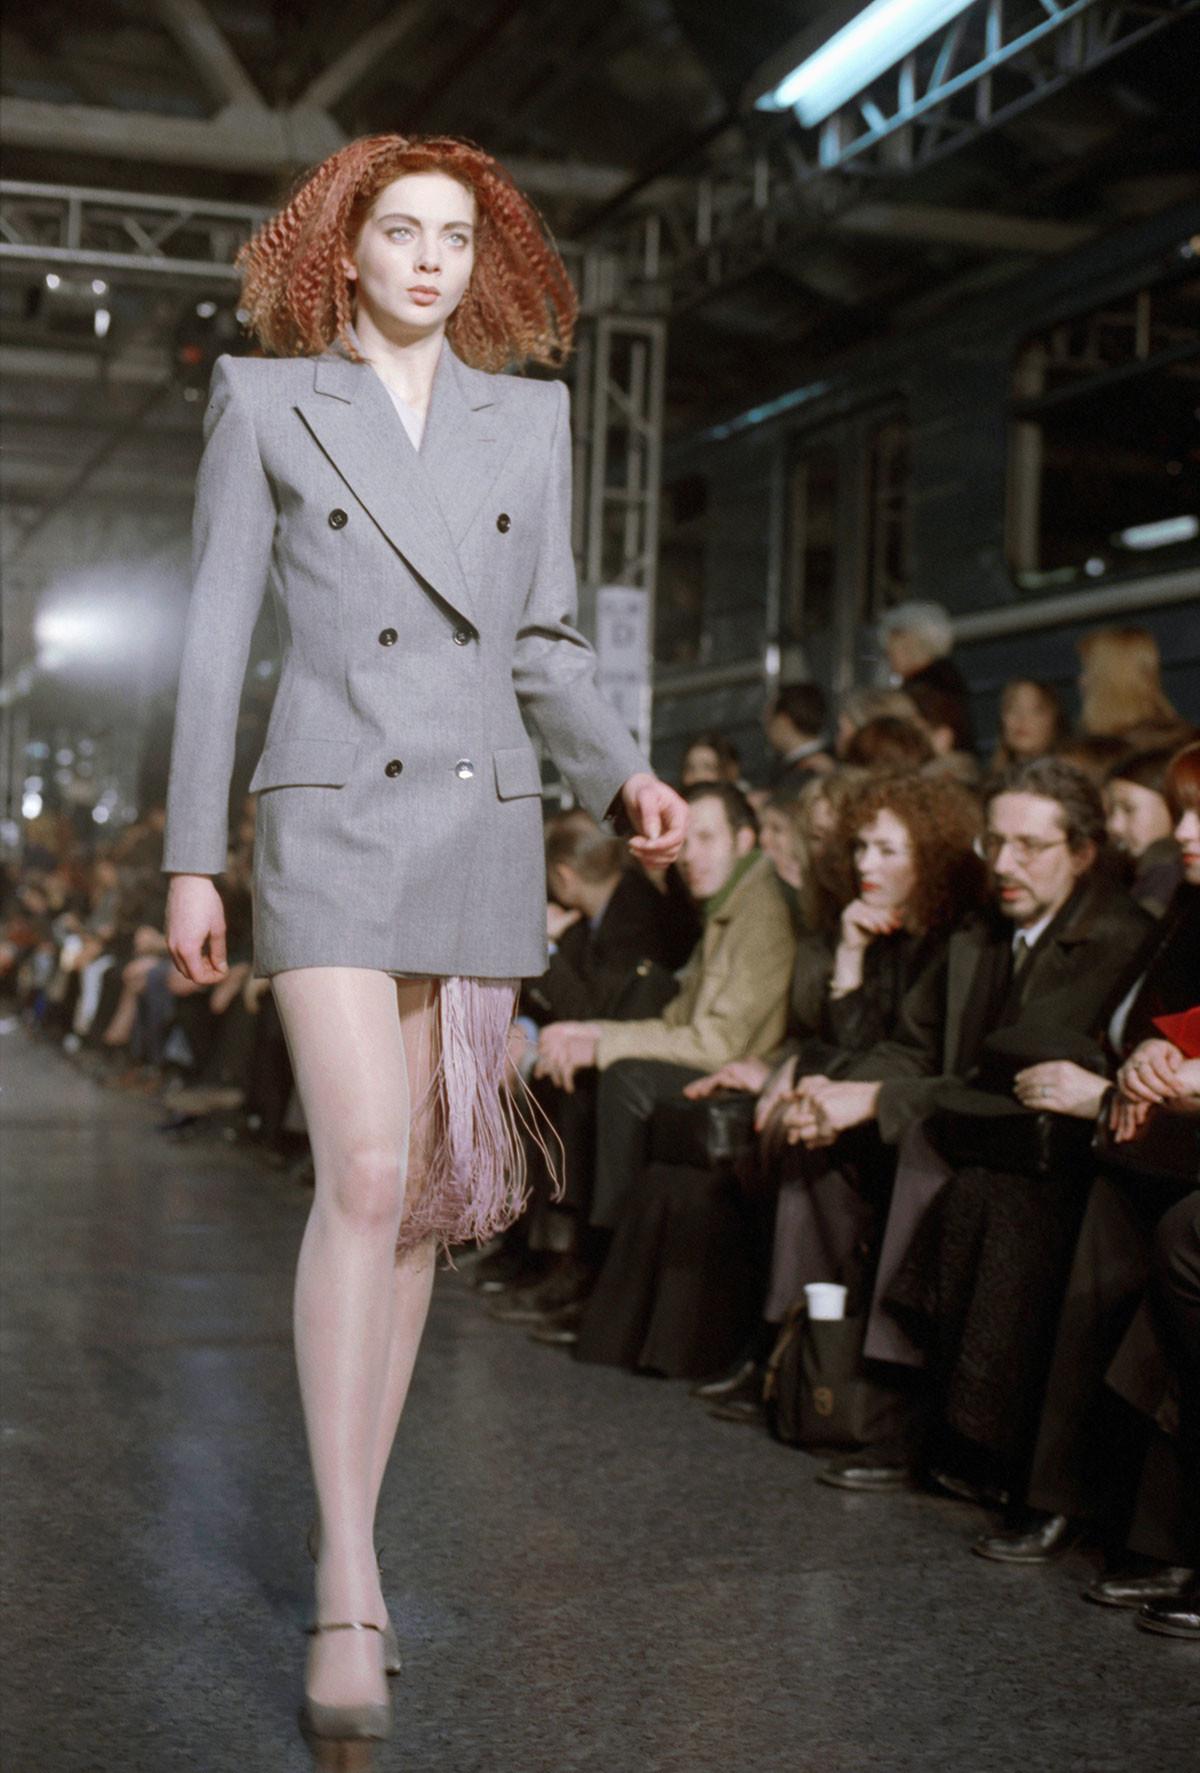 Givenchy Fashion show at the Moscow Metro Sokol metro station depot